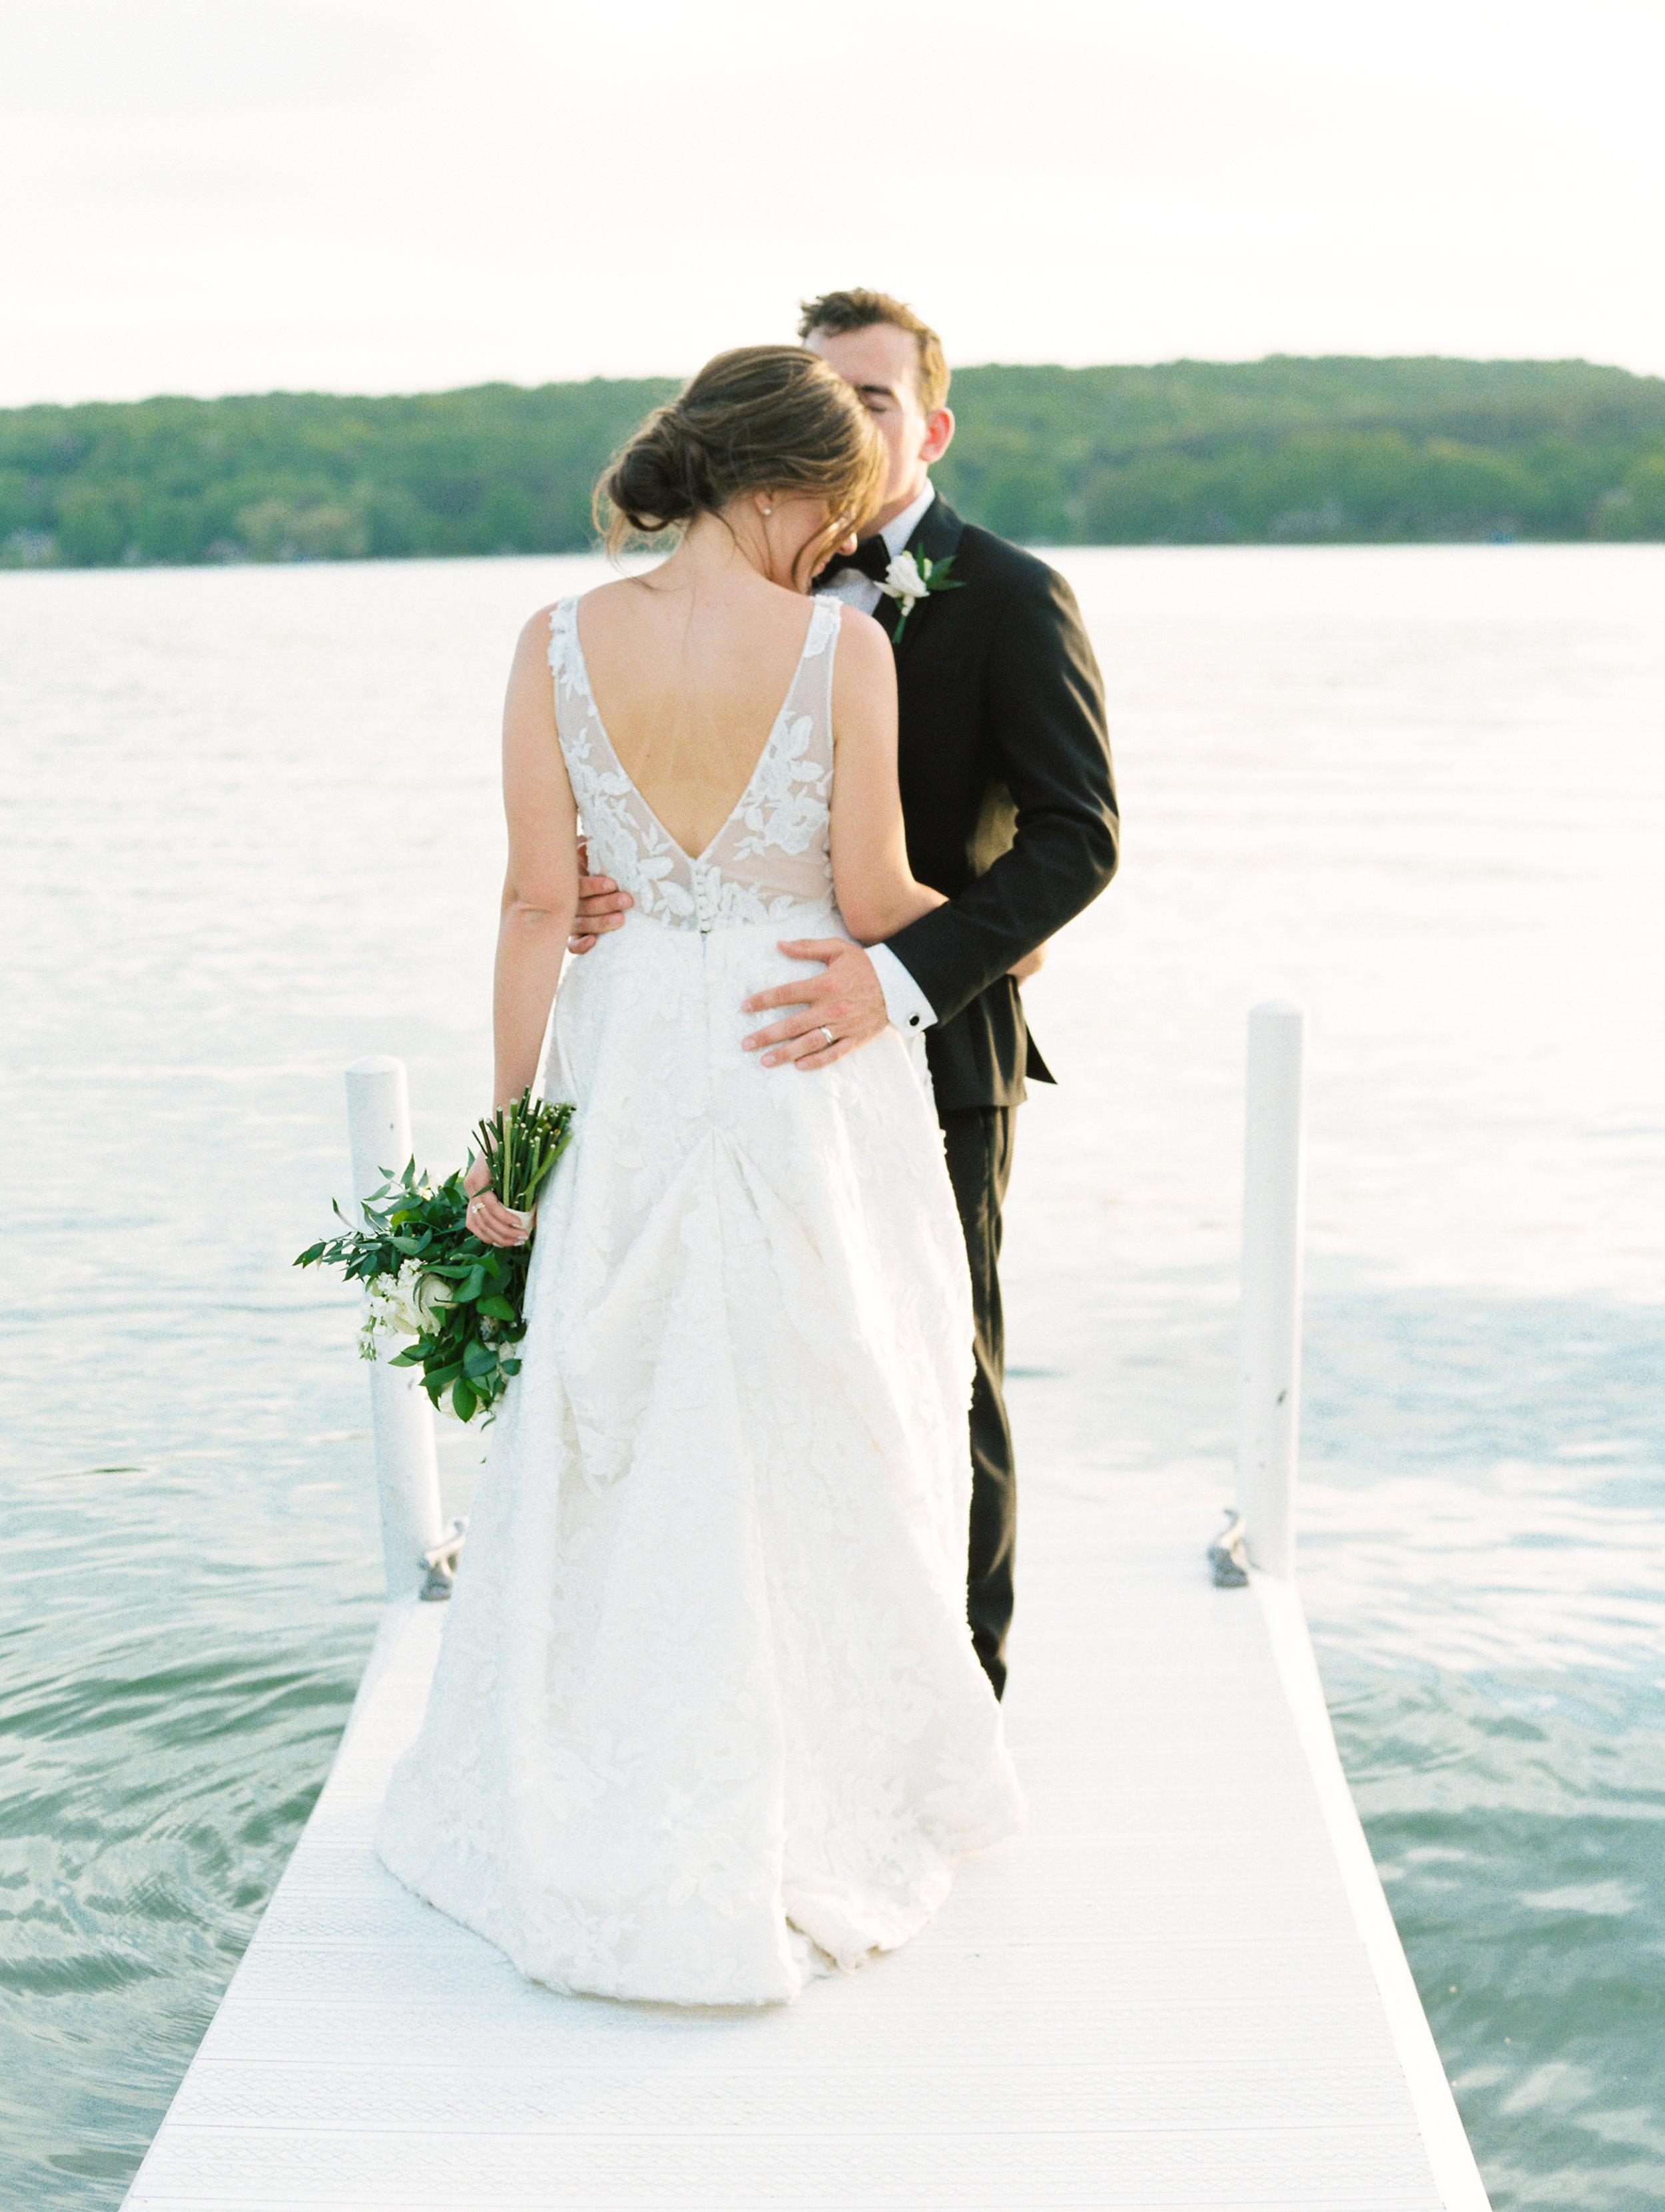 DeGuilio+Wedding+BrideGroomSunsetf-20.jpg